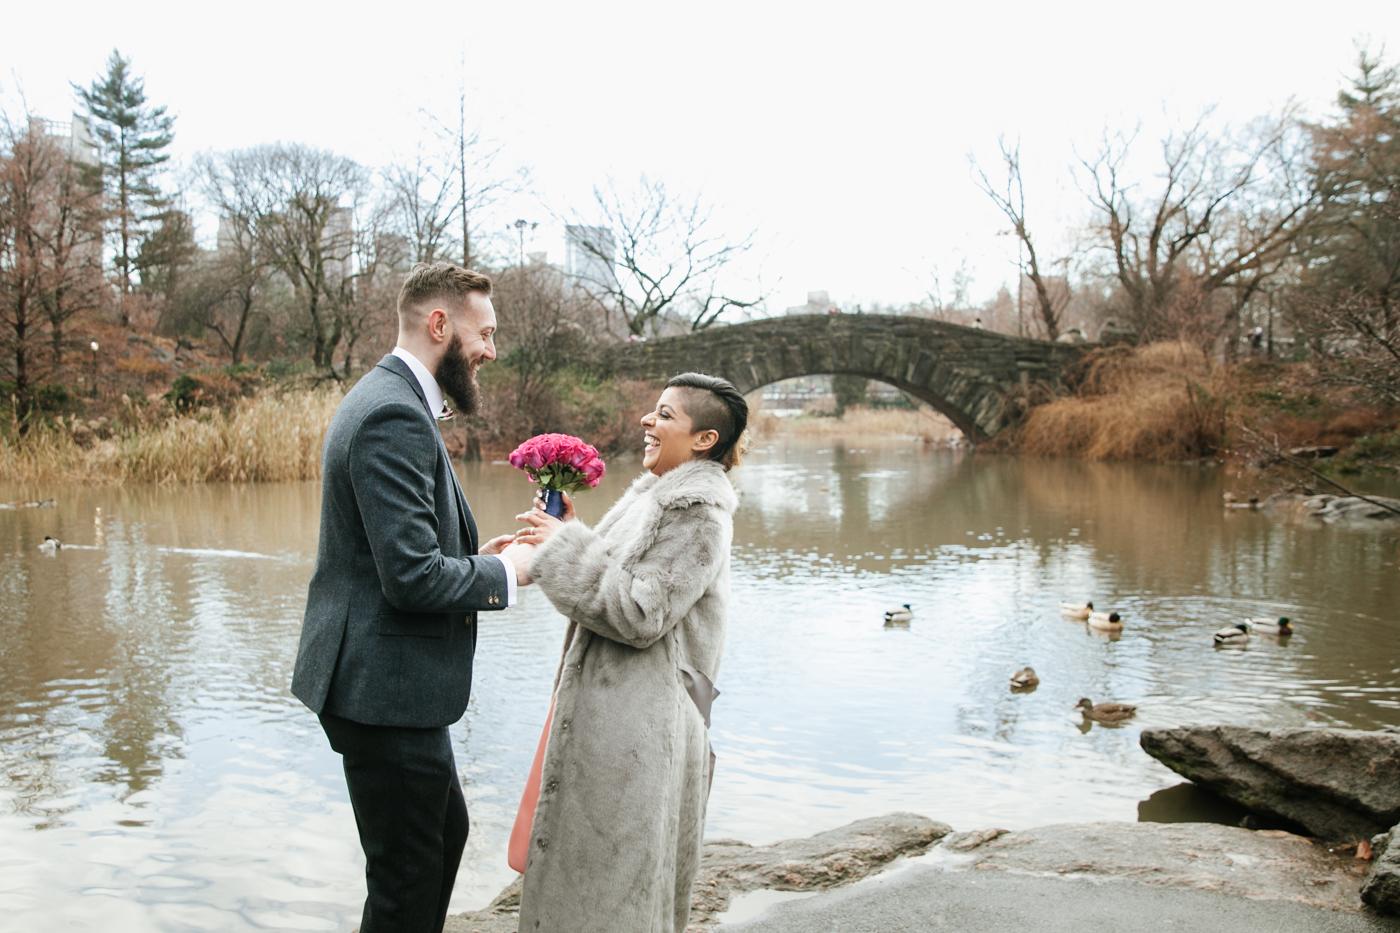 Central-park-wedding-by-Tanya-Isaeva-95.jpg